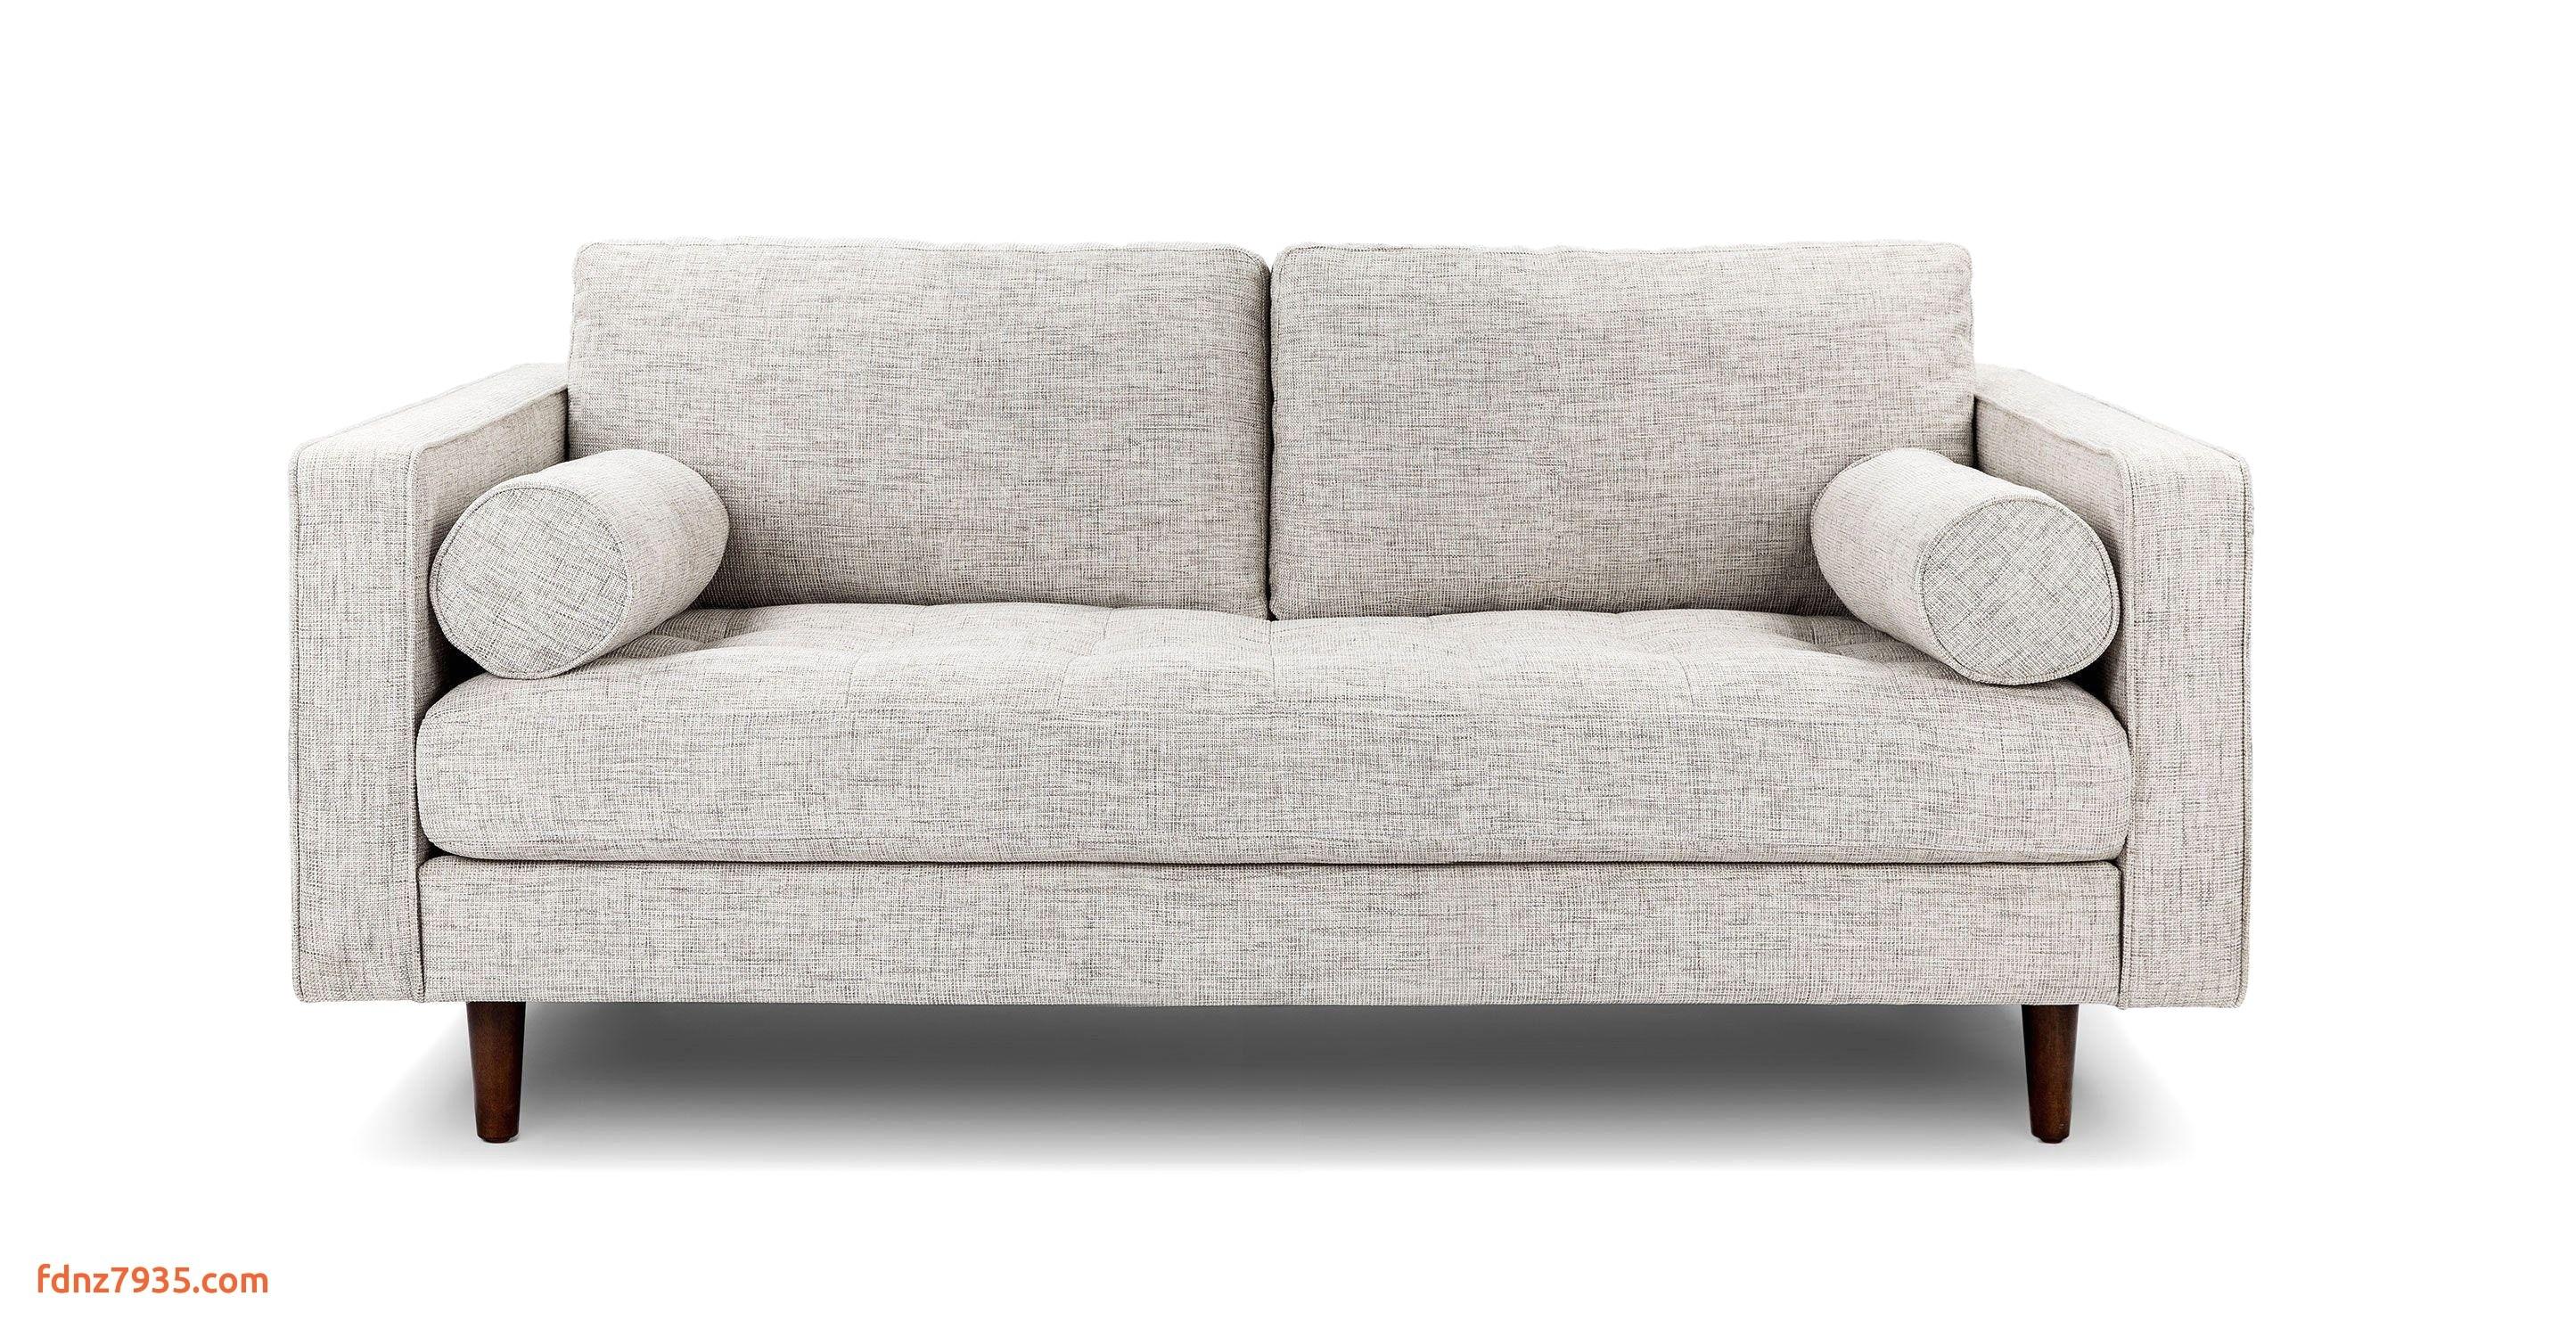 black patio chairs luxury furniture outdoor loveseat beautiful wicker outdoor sofa 0d